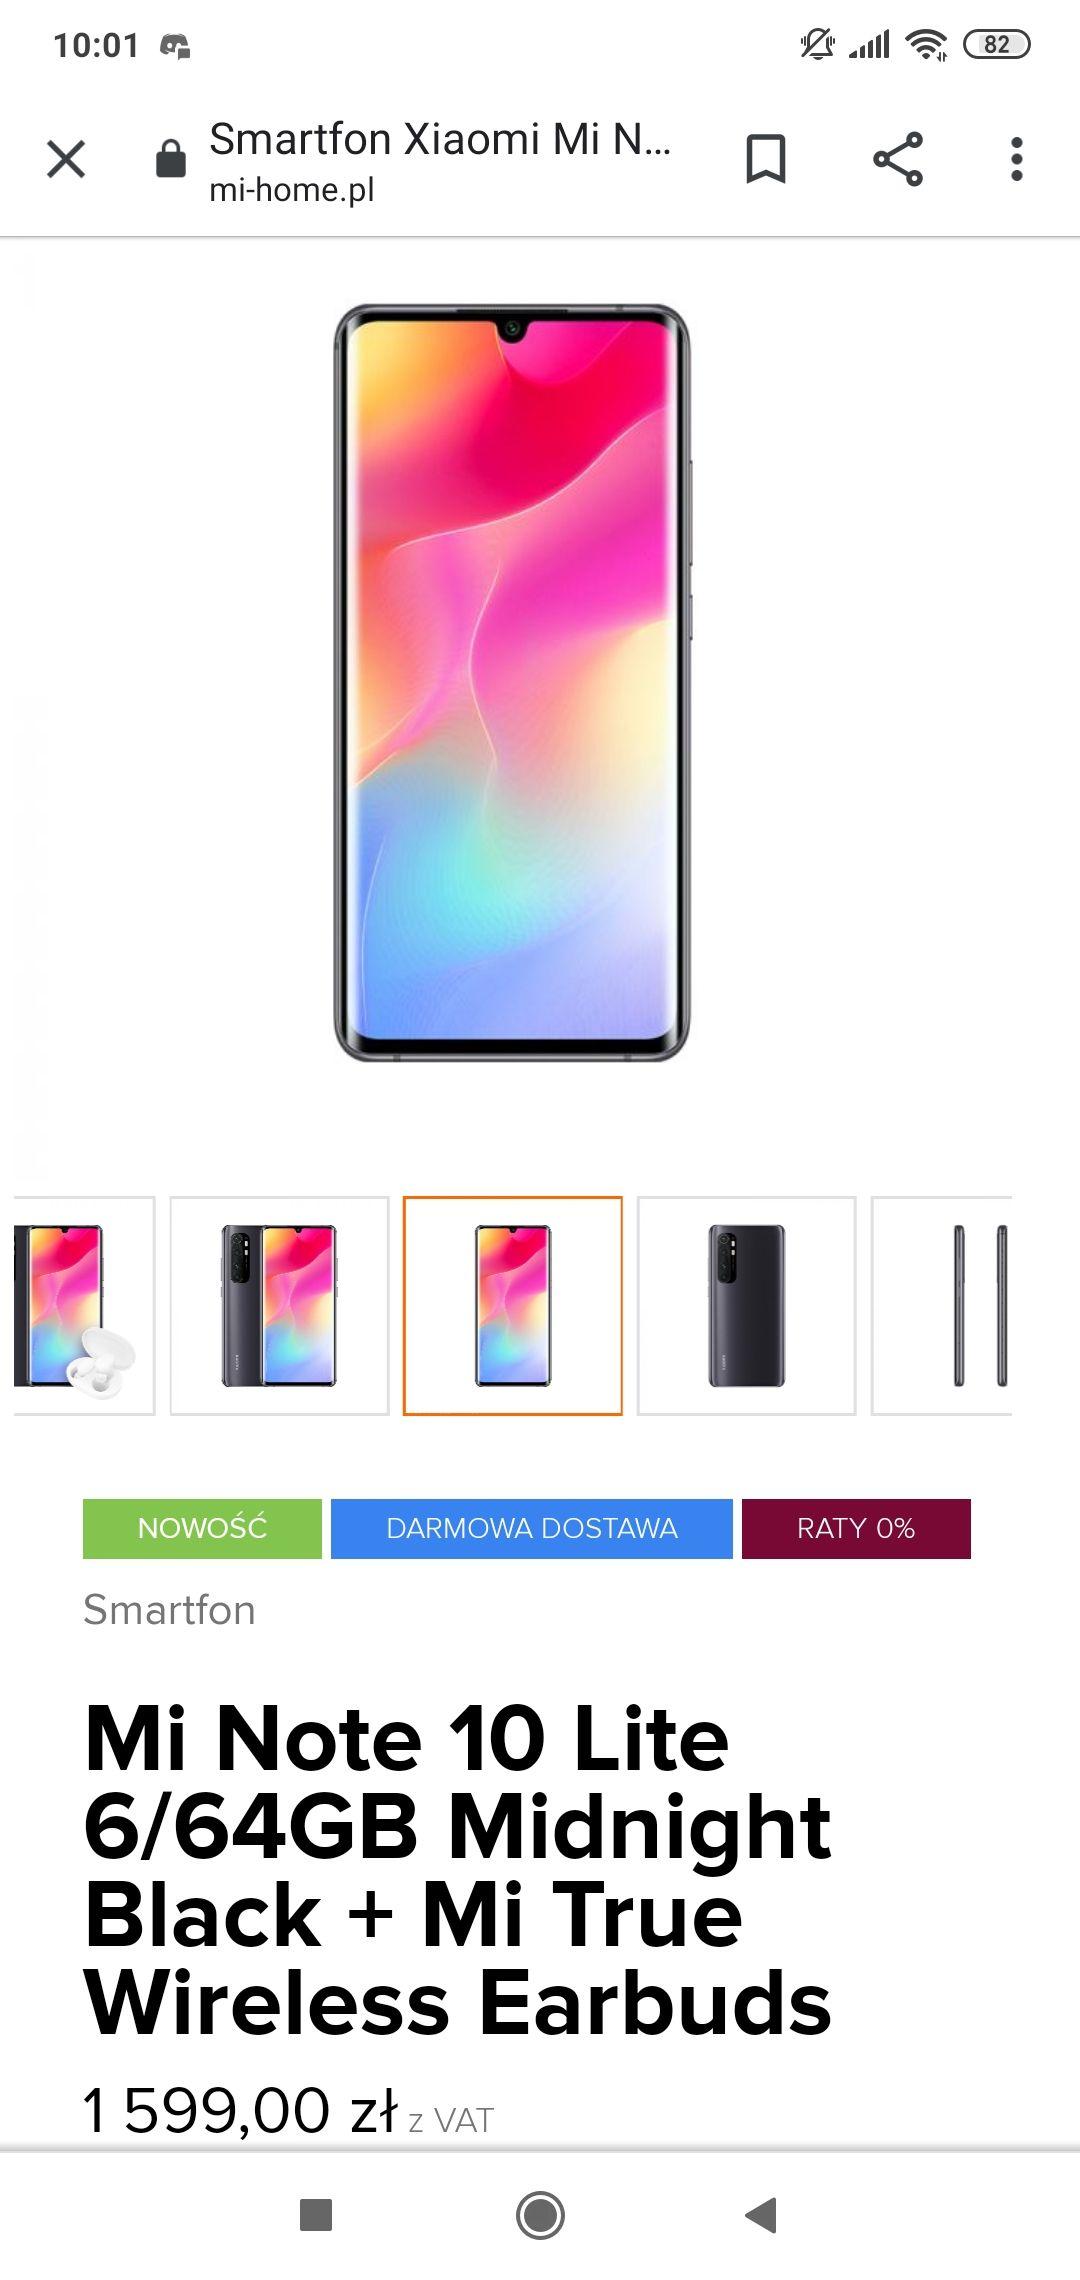 Xiaomi Mi Note 10 Lite + Mi True Wireless Earbuds